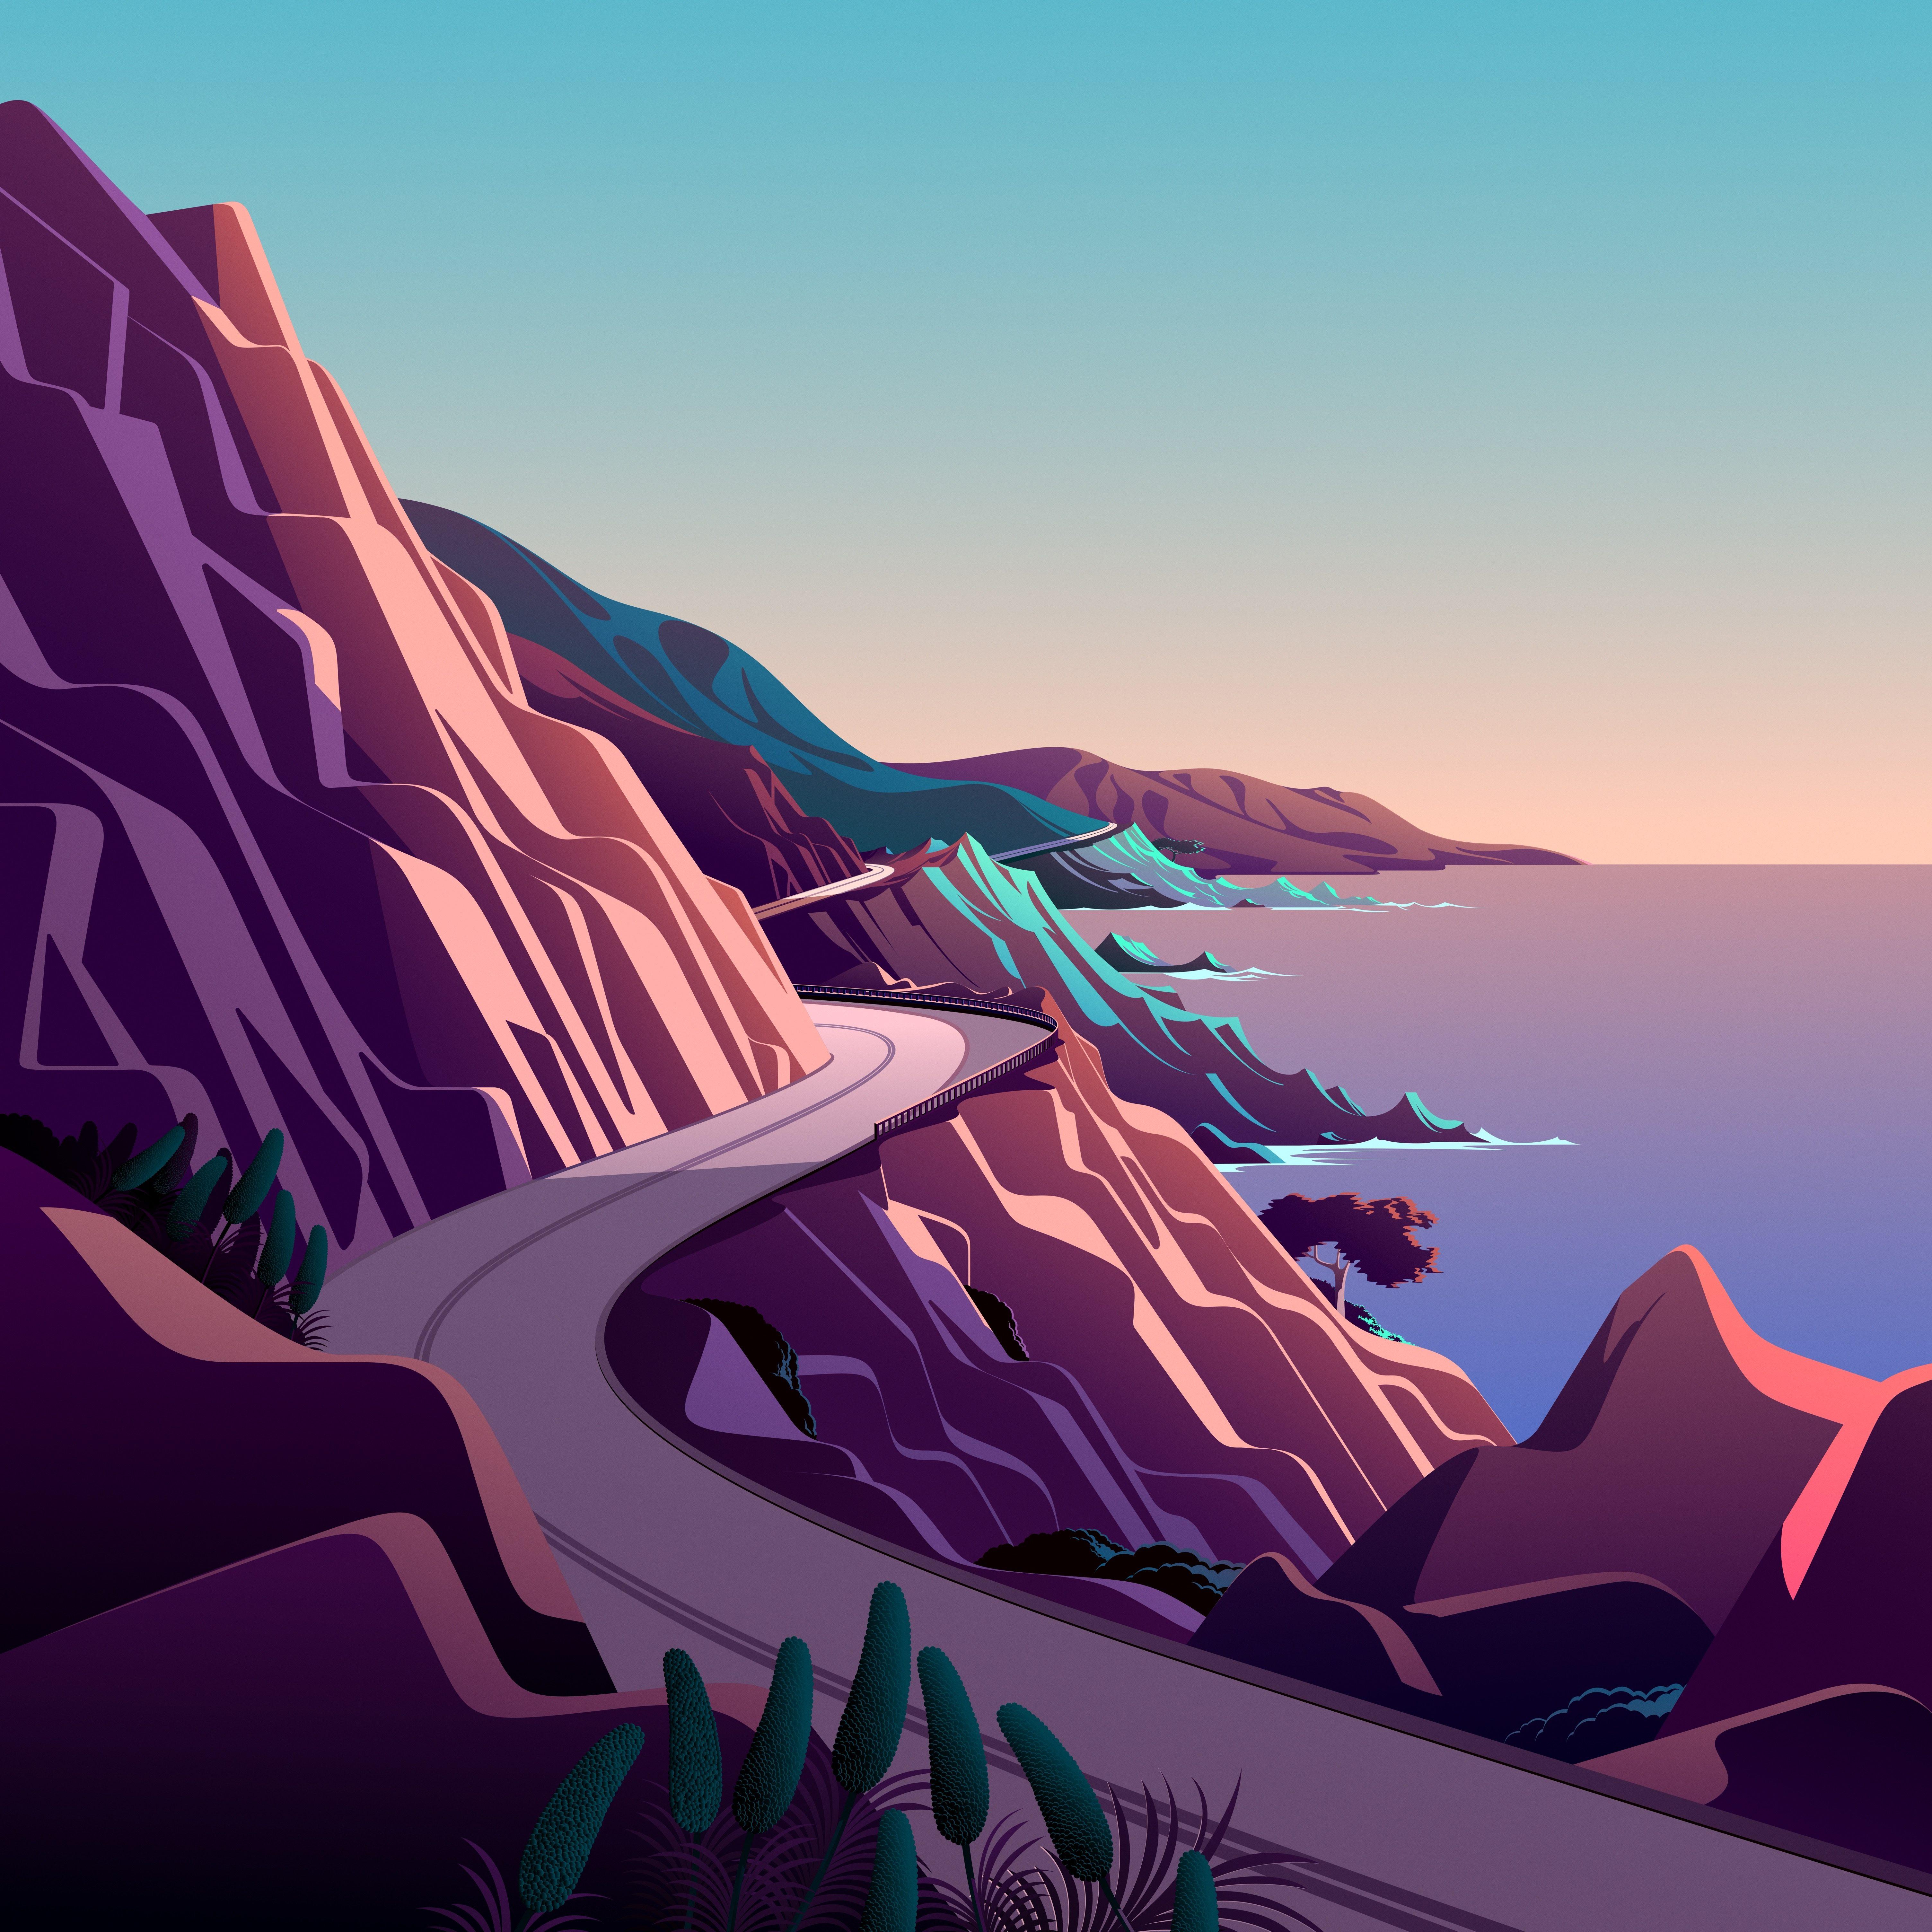 macOS Big Sur The Cliffs 1 dragged